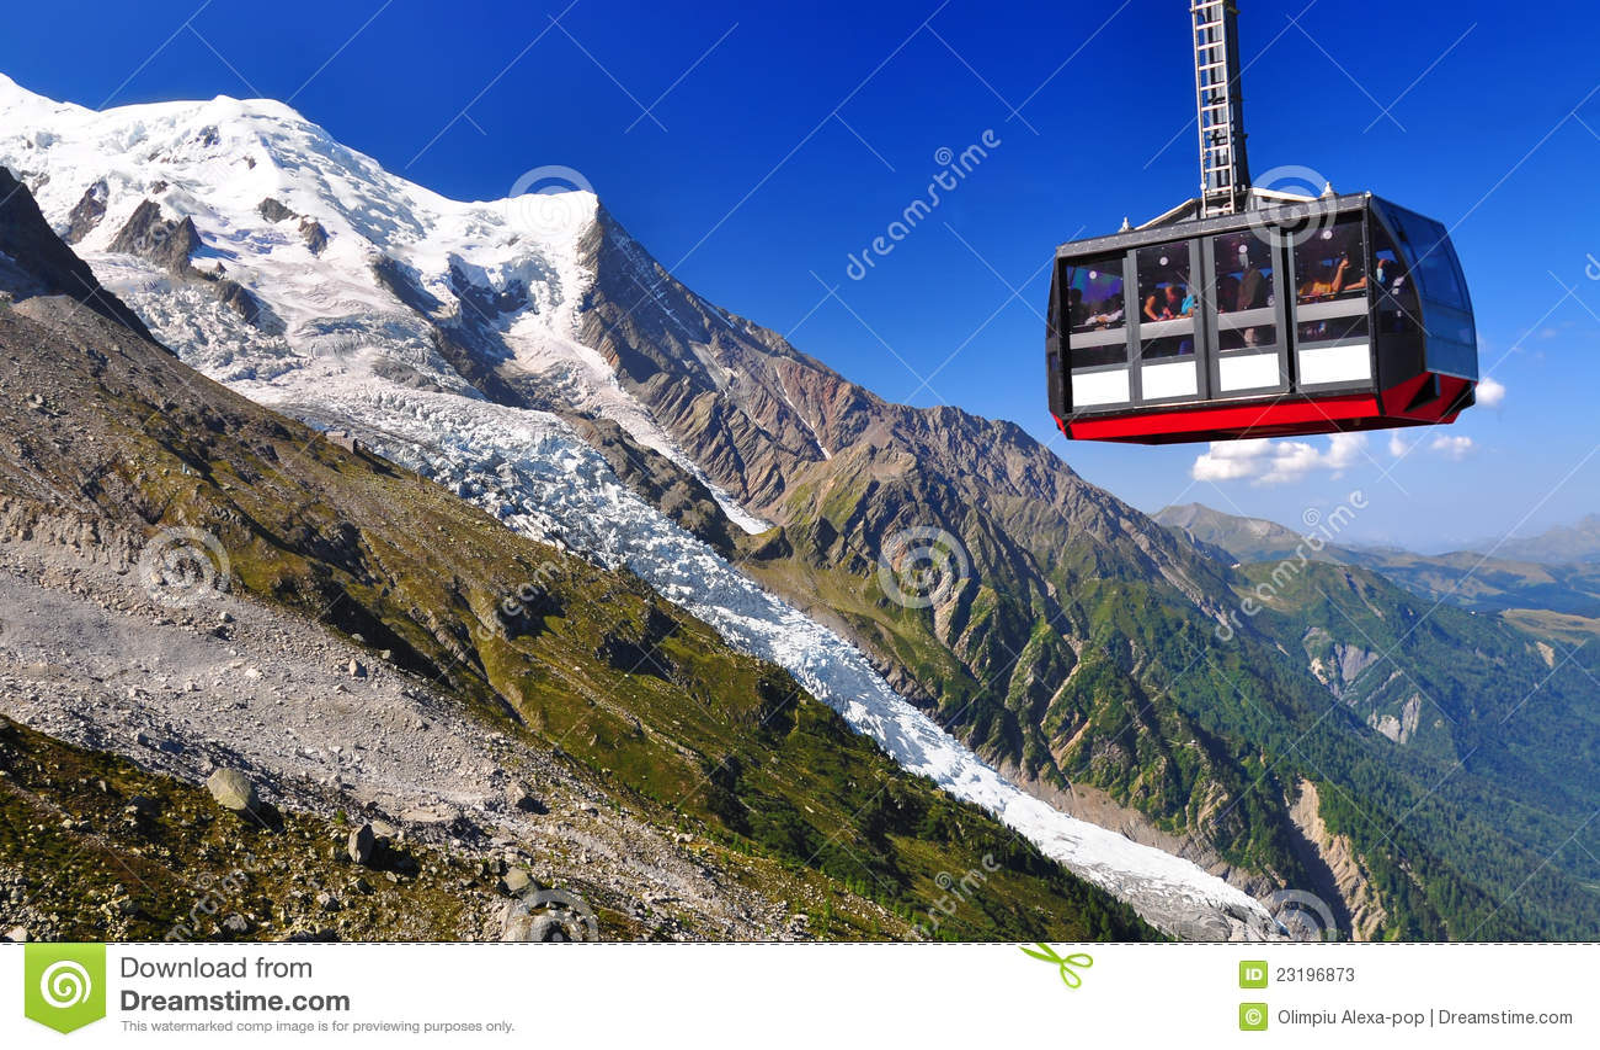 Aiguille du Midi cable car in Chamonix